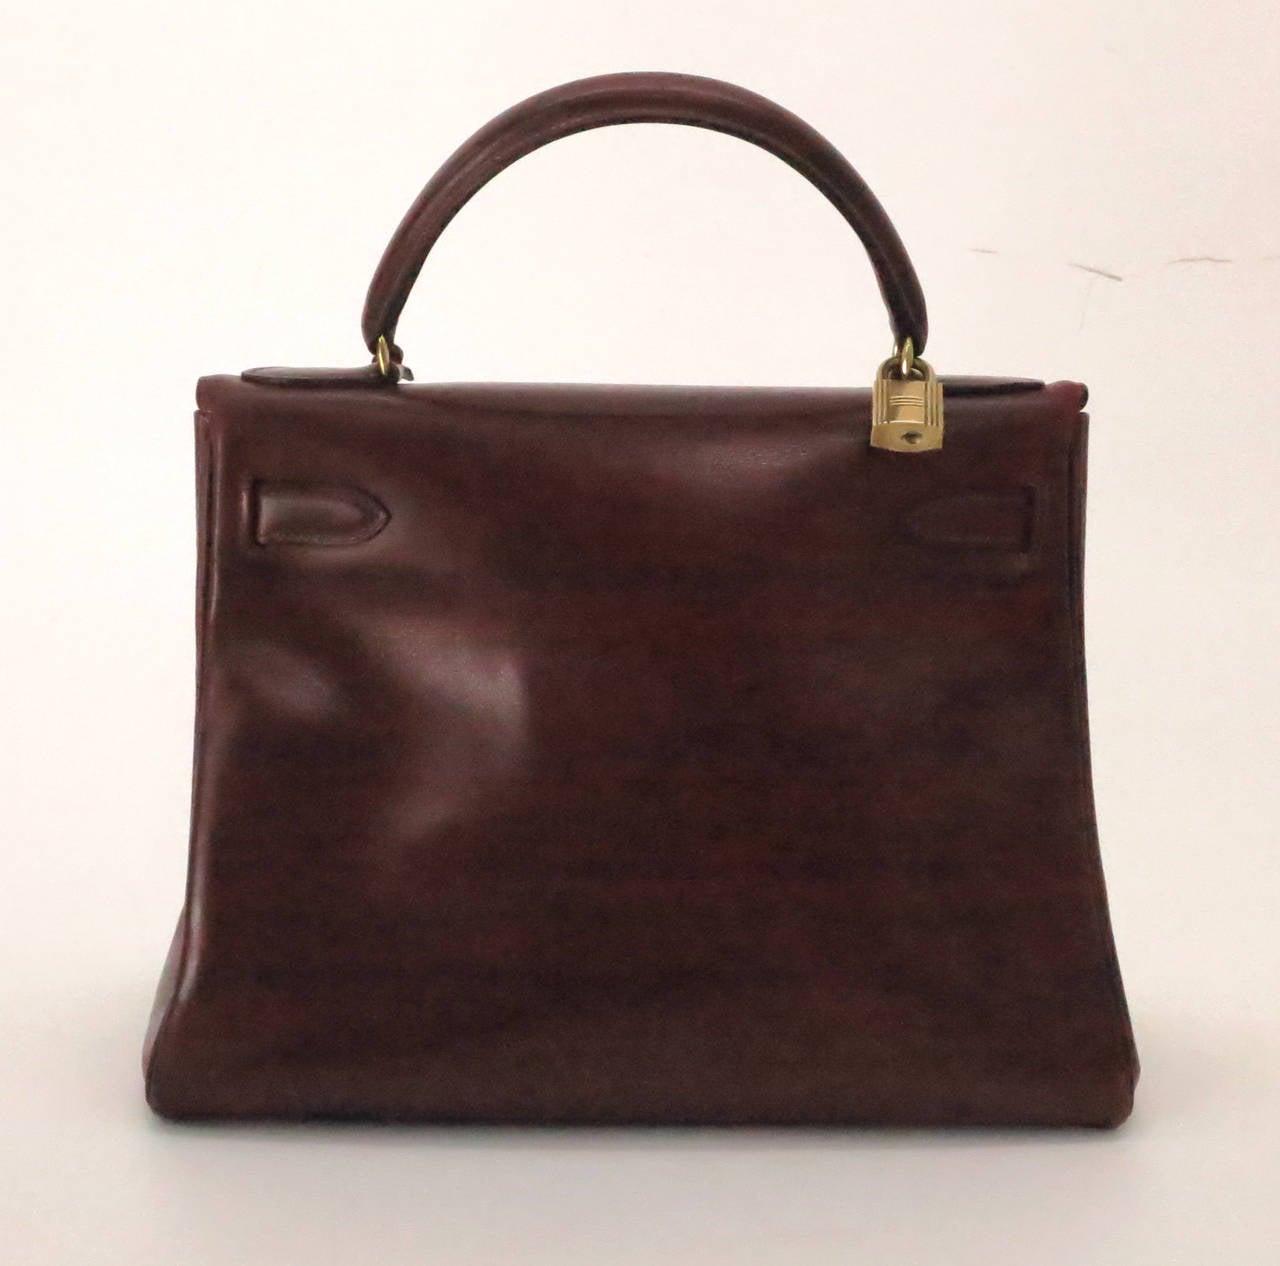 780333820a96 Women s 1960 P Hermes 28cm Kelly bag in burgundy box calf For Sale